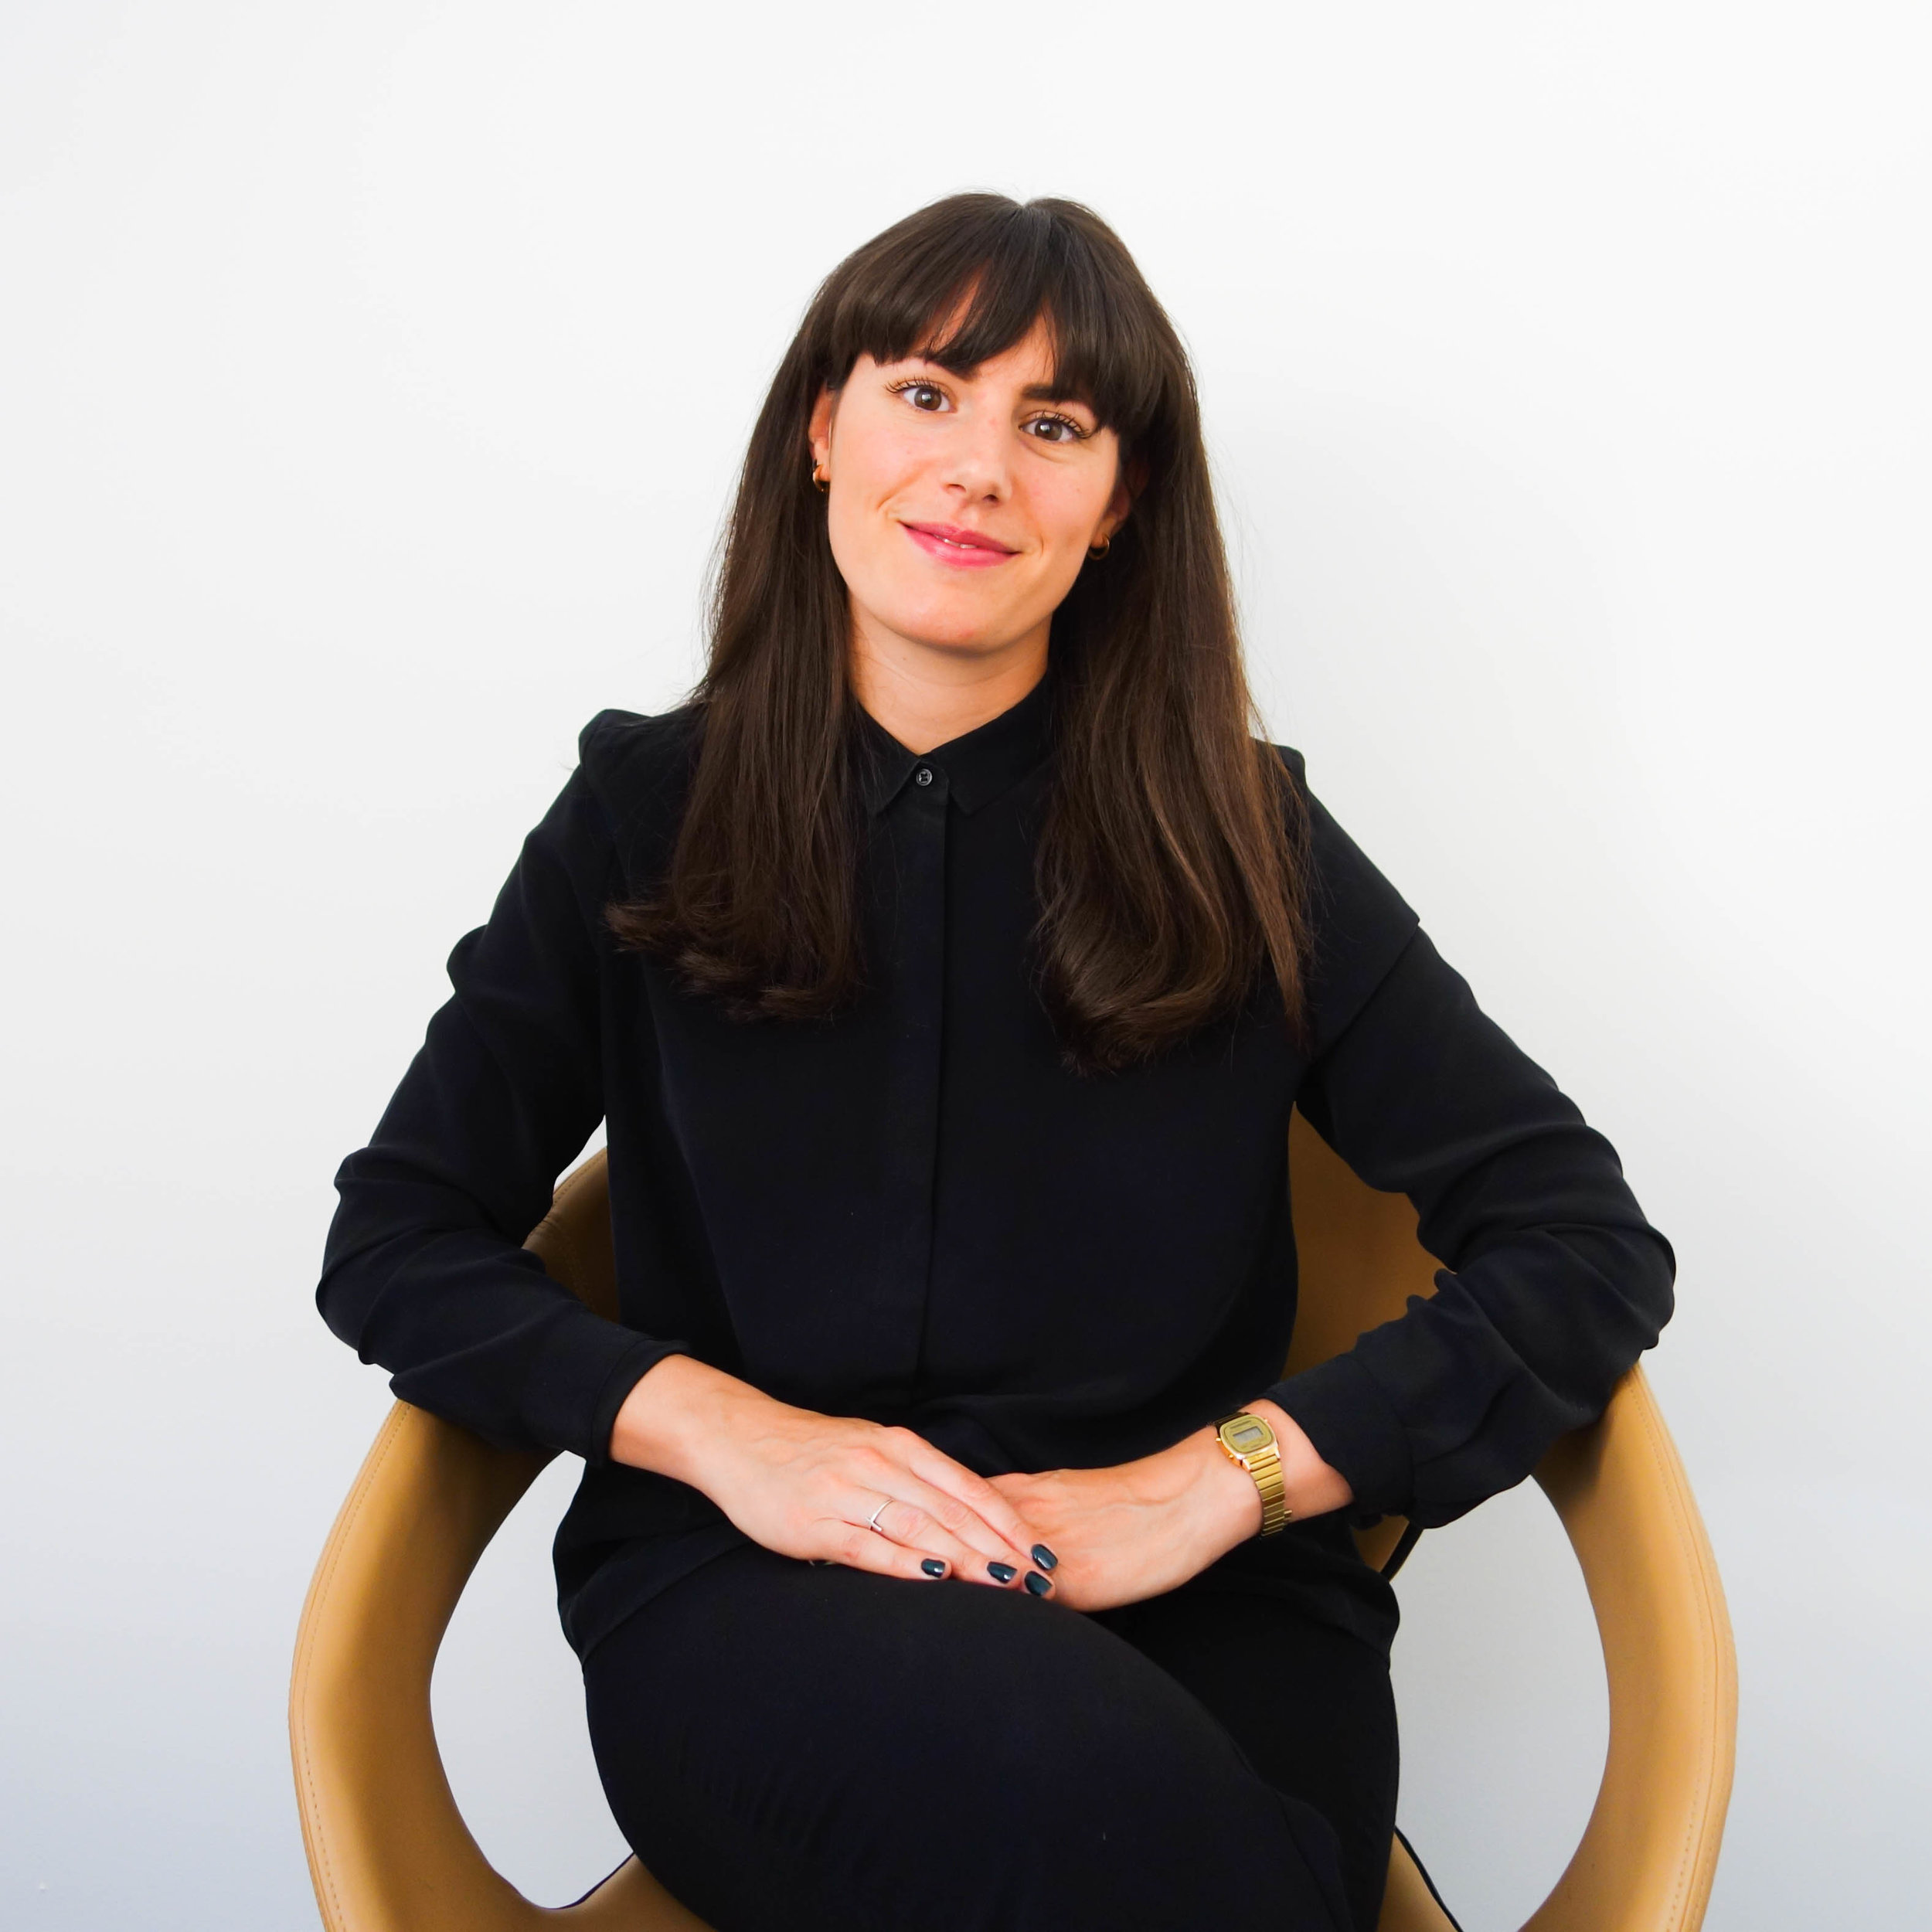 Erica Ivarsson   Byggnadsingenjör  erica.ivarsson@elindersten.se +46(0)70-779 44 97